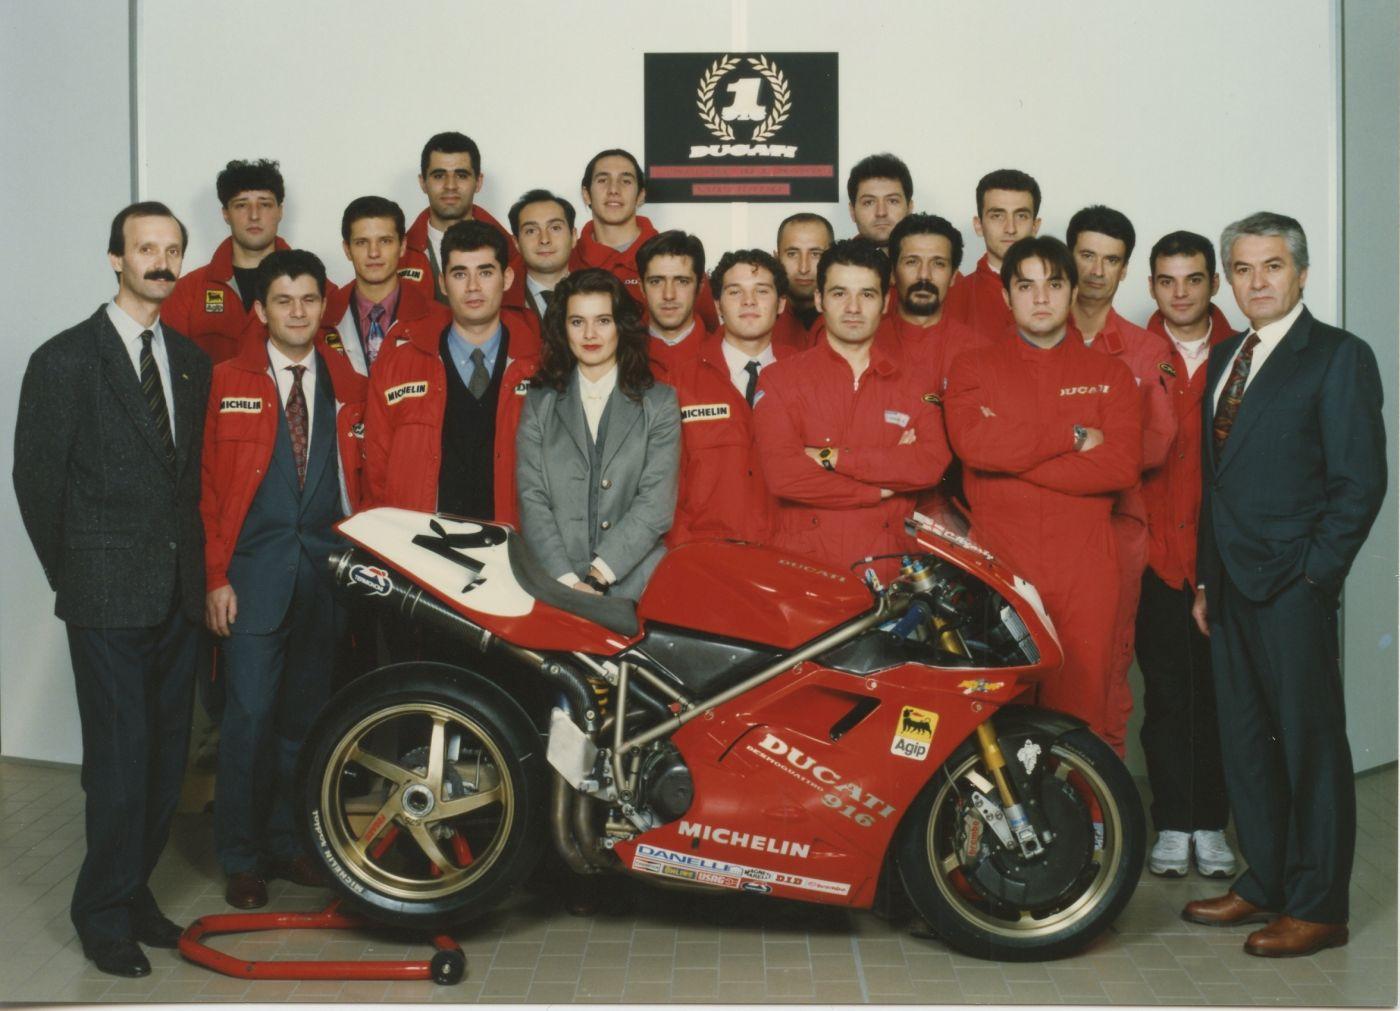 Massimo Tamburini Ducati 916 (1)